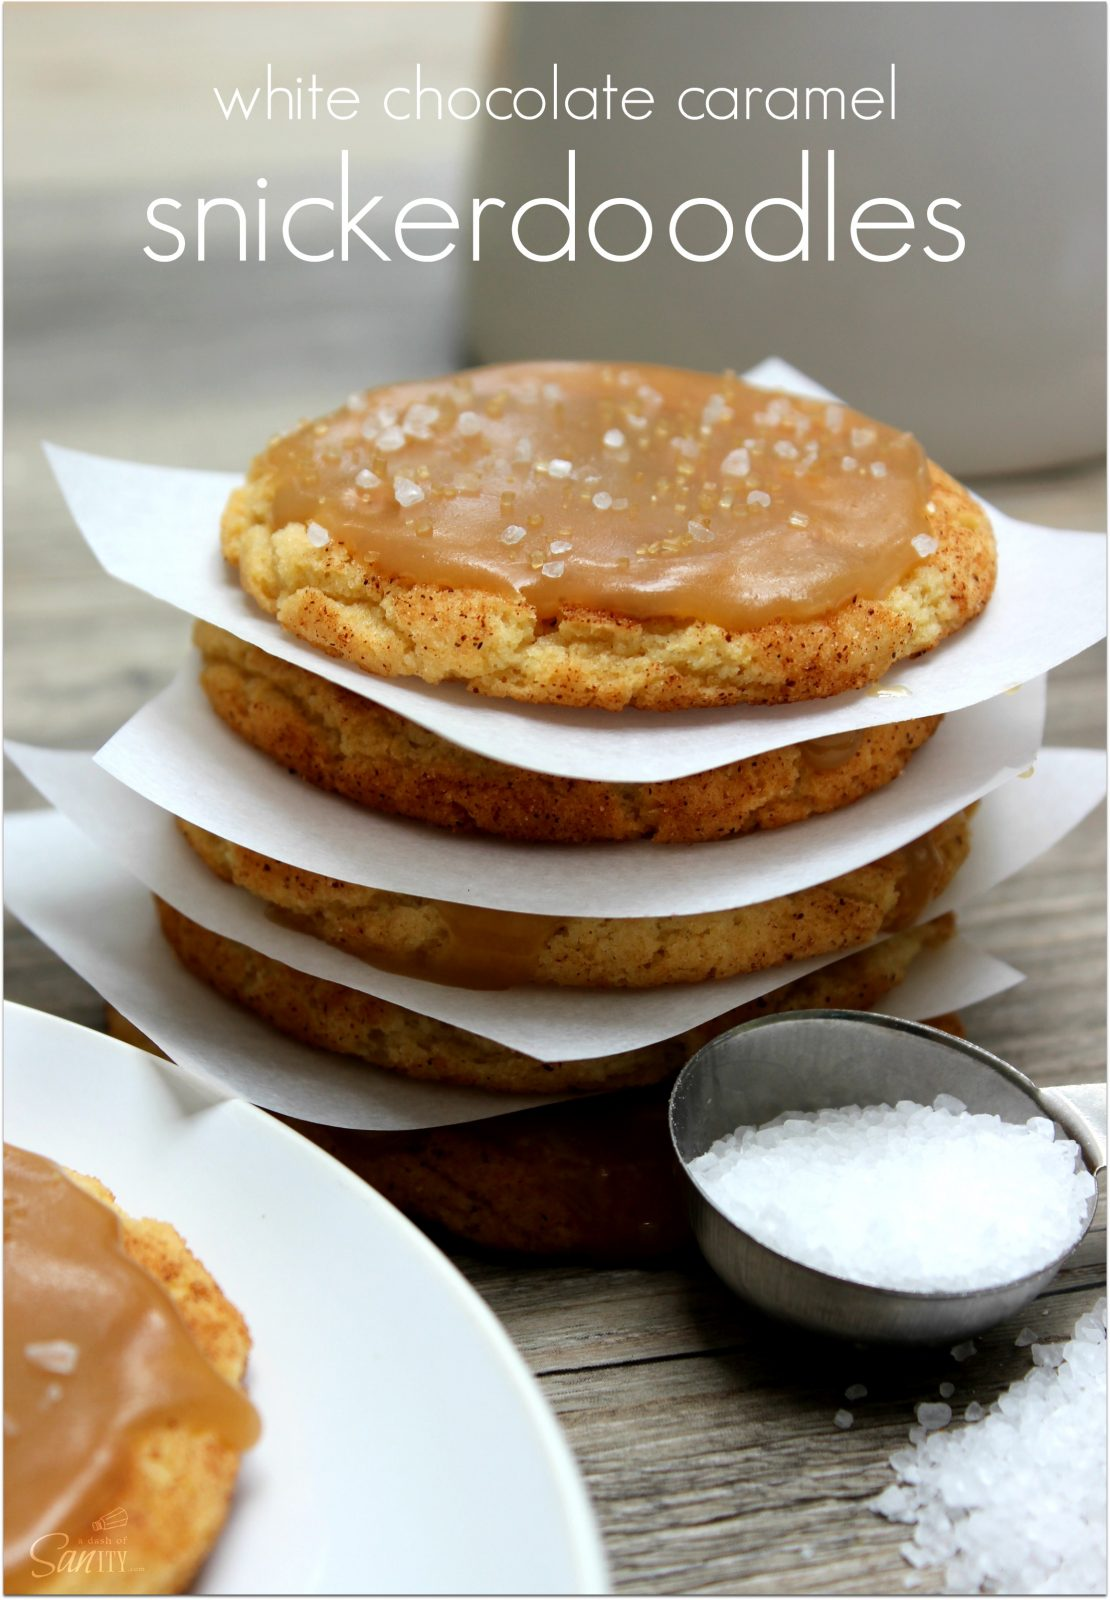 White-chocolate-caramel-snickerdoodles-main